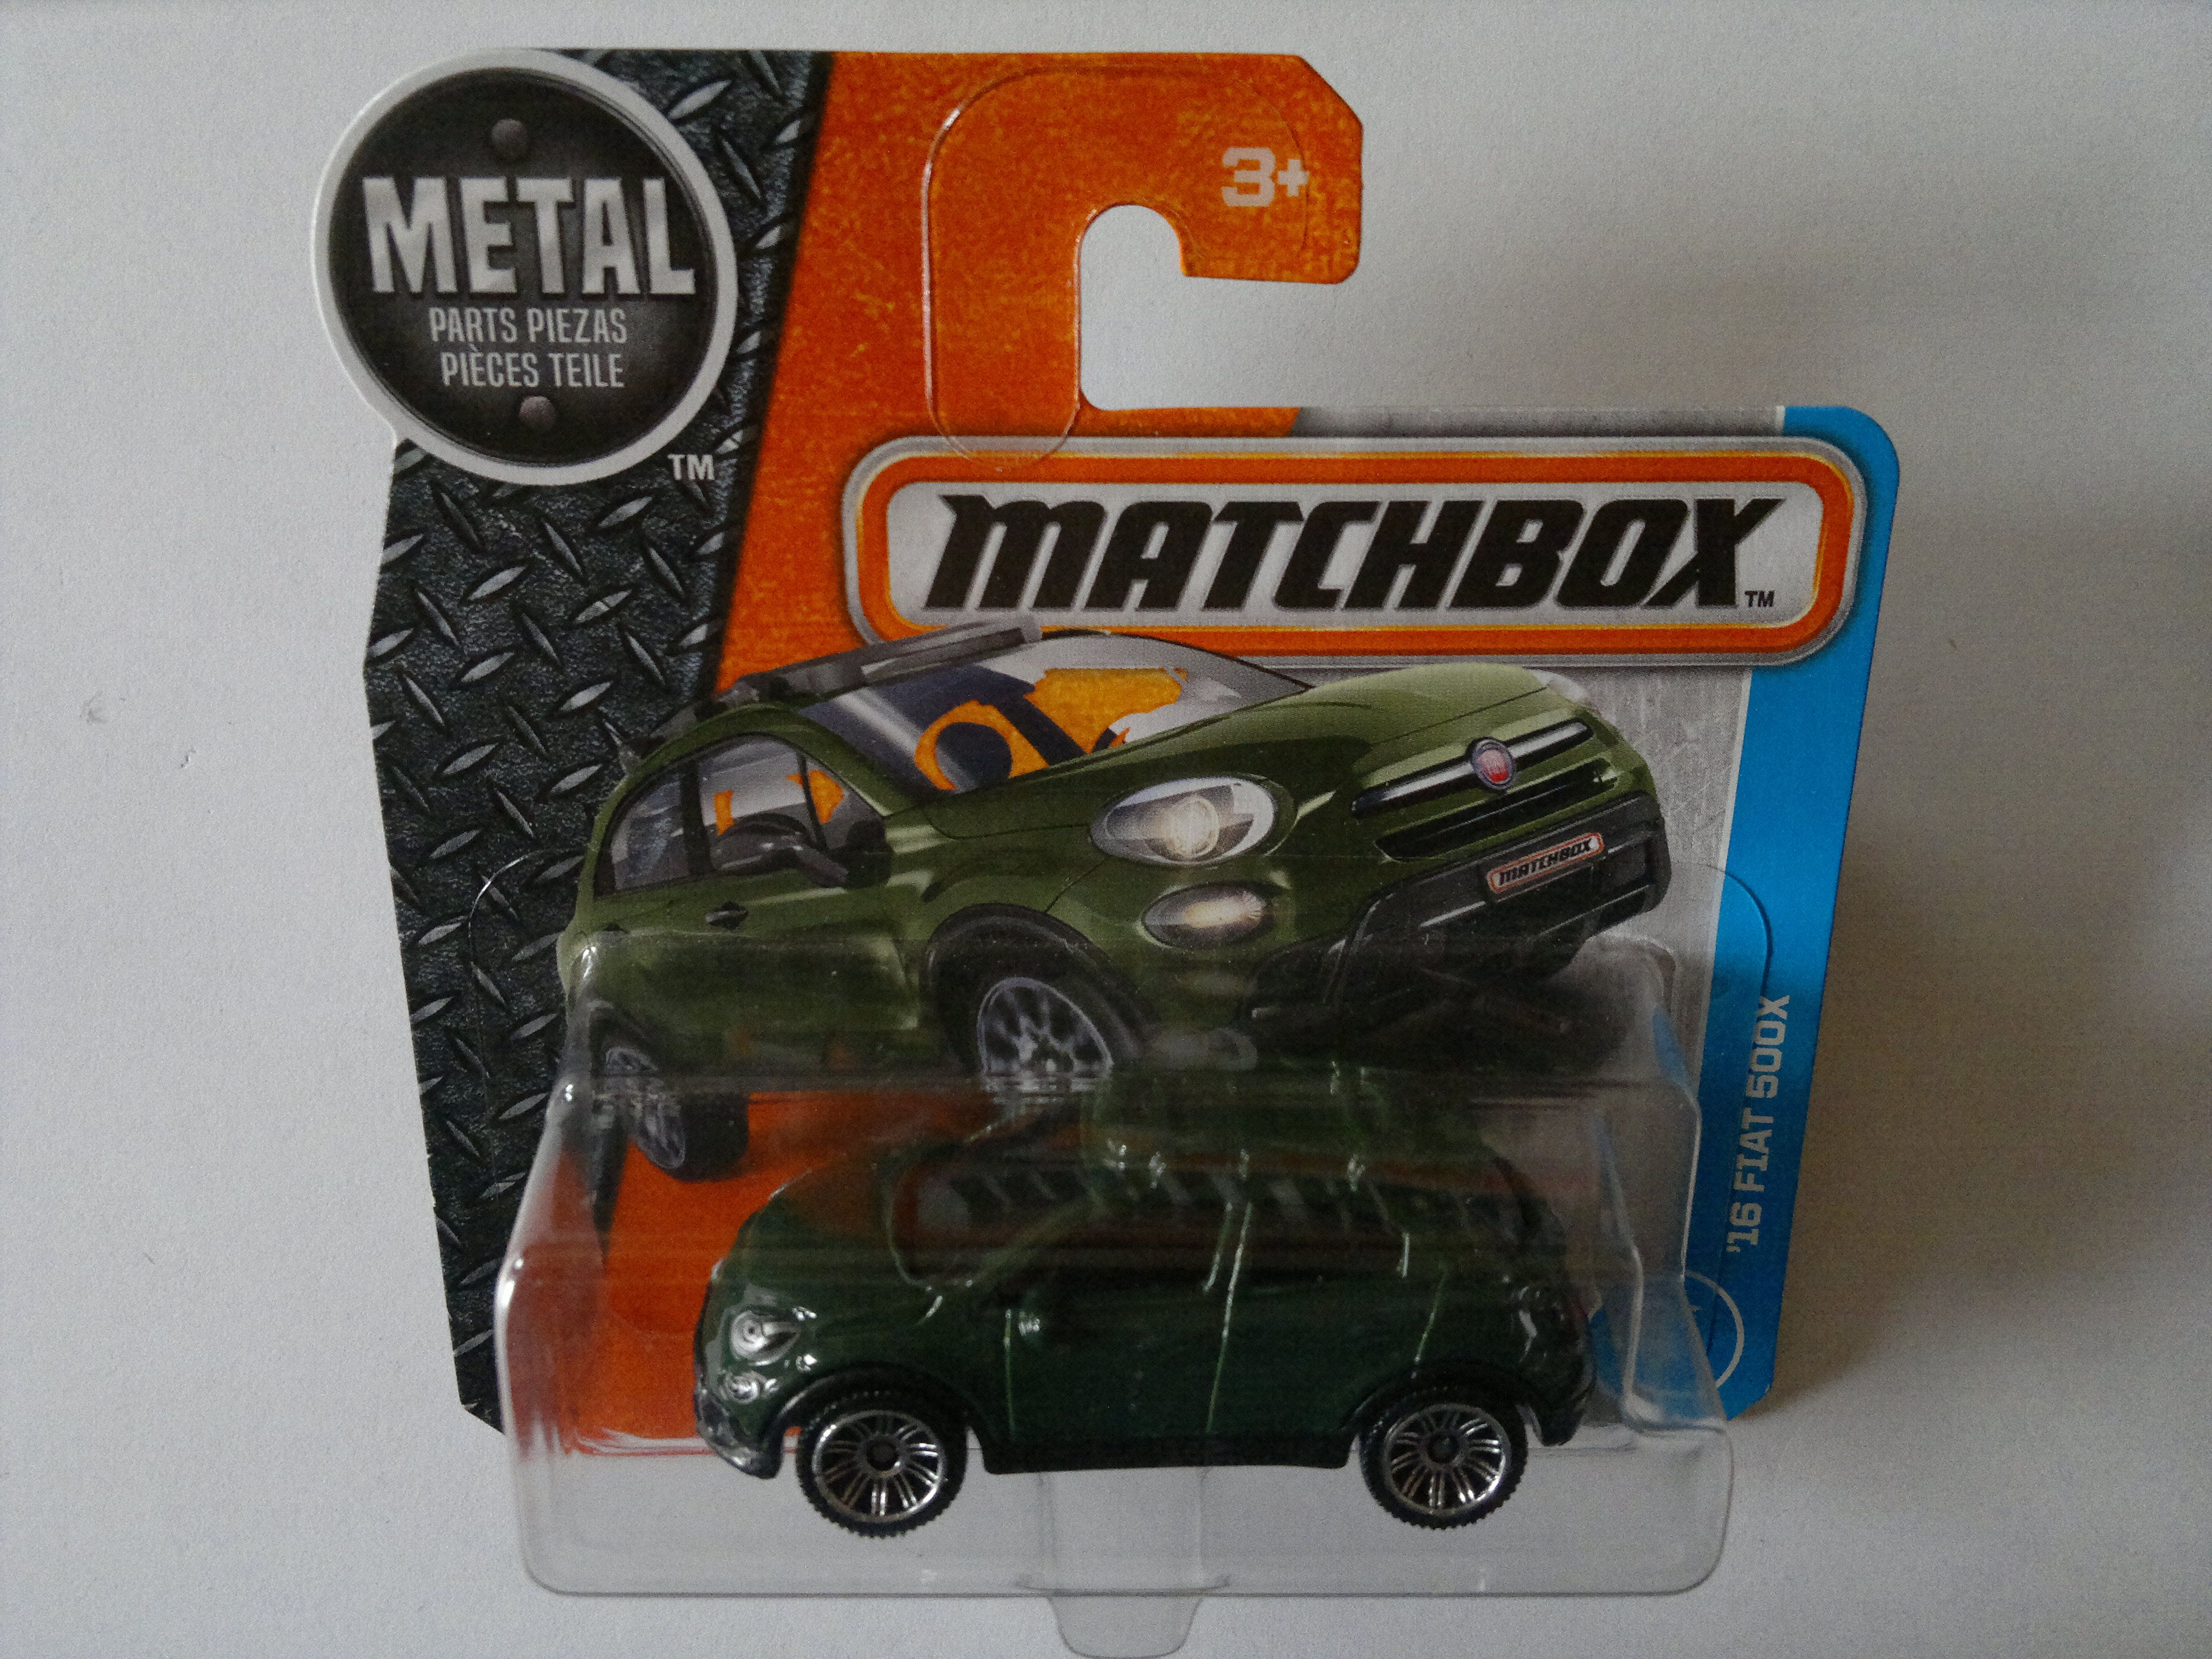 2017 - FIAT 500X ´2016 (Matchbox/MBX)   Matchbox/MBX/Mattel 1:64 ...